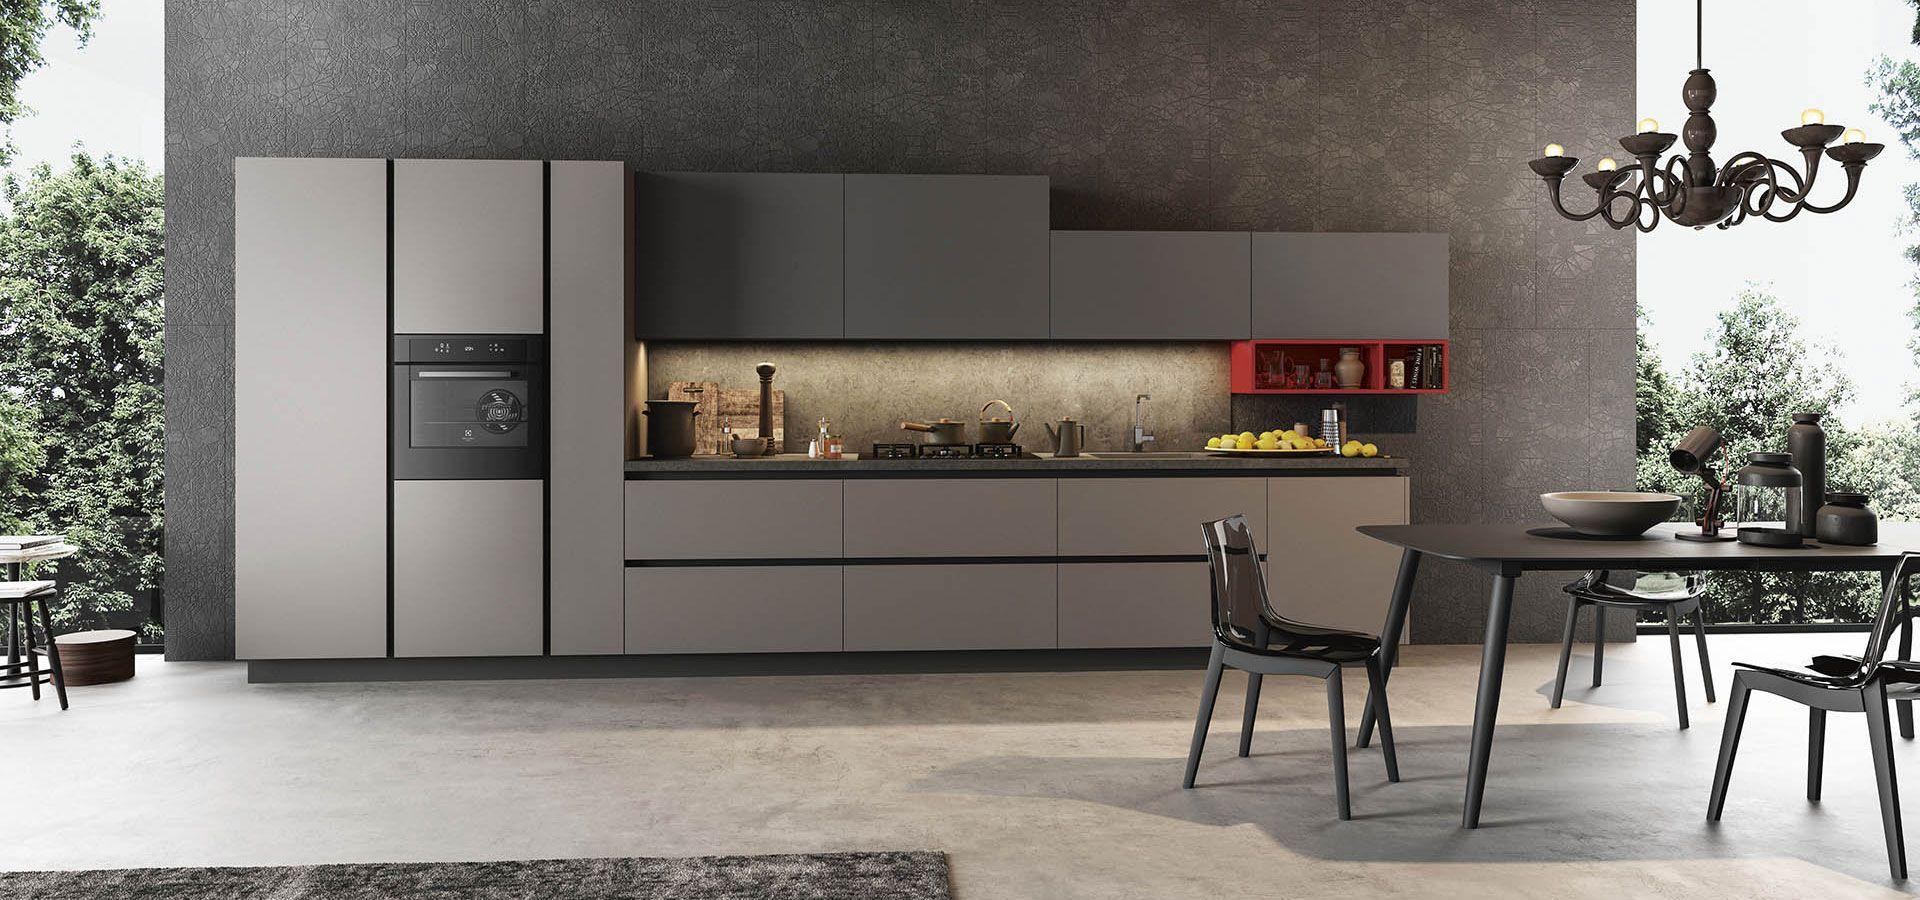 Cucina Moderna - Time Finiture: grigio opaco, vulcano opaco, rosso ...